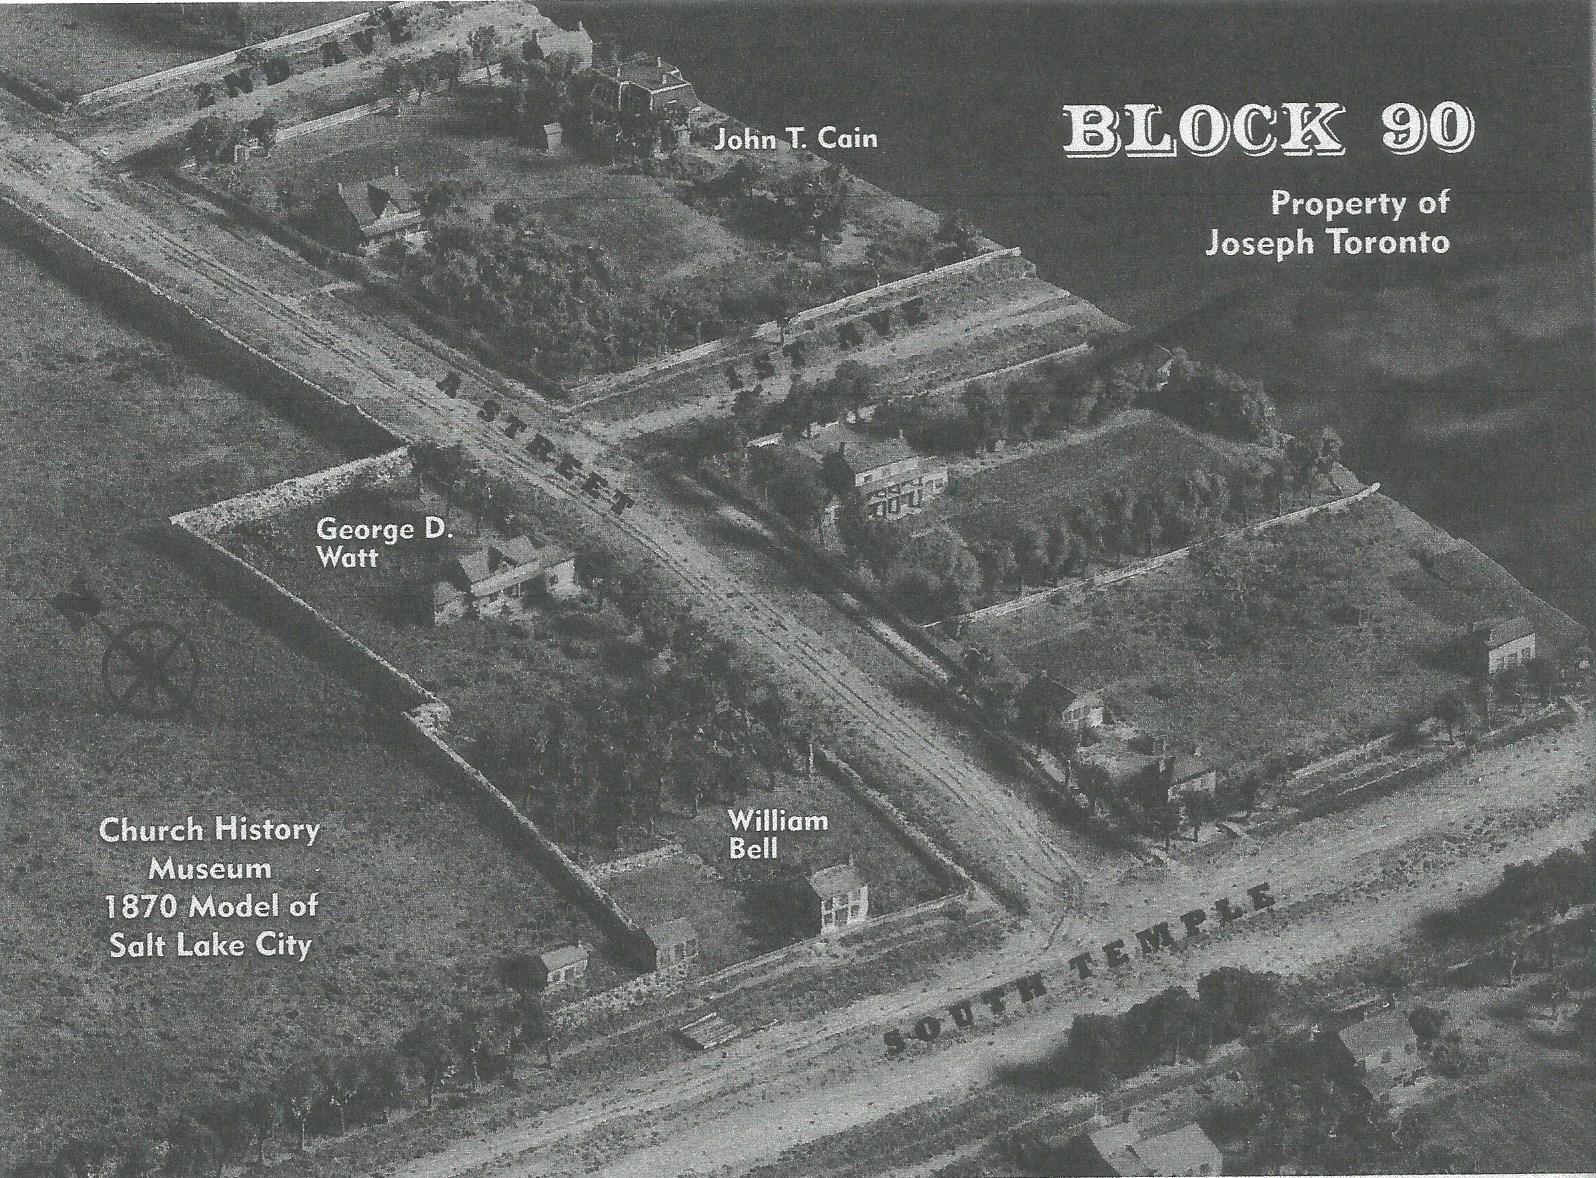 Joseph Toronto's property in Great Salt Lake City